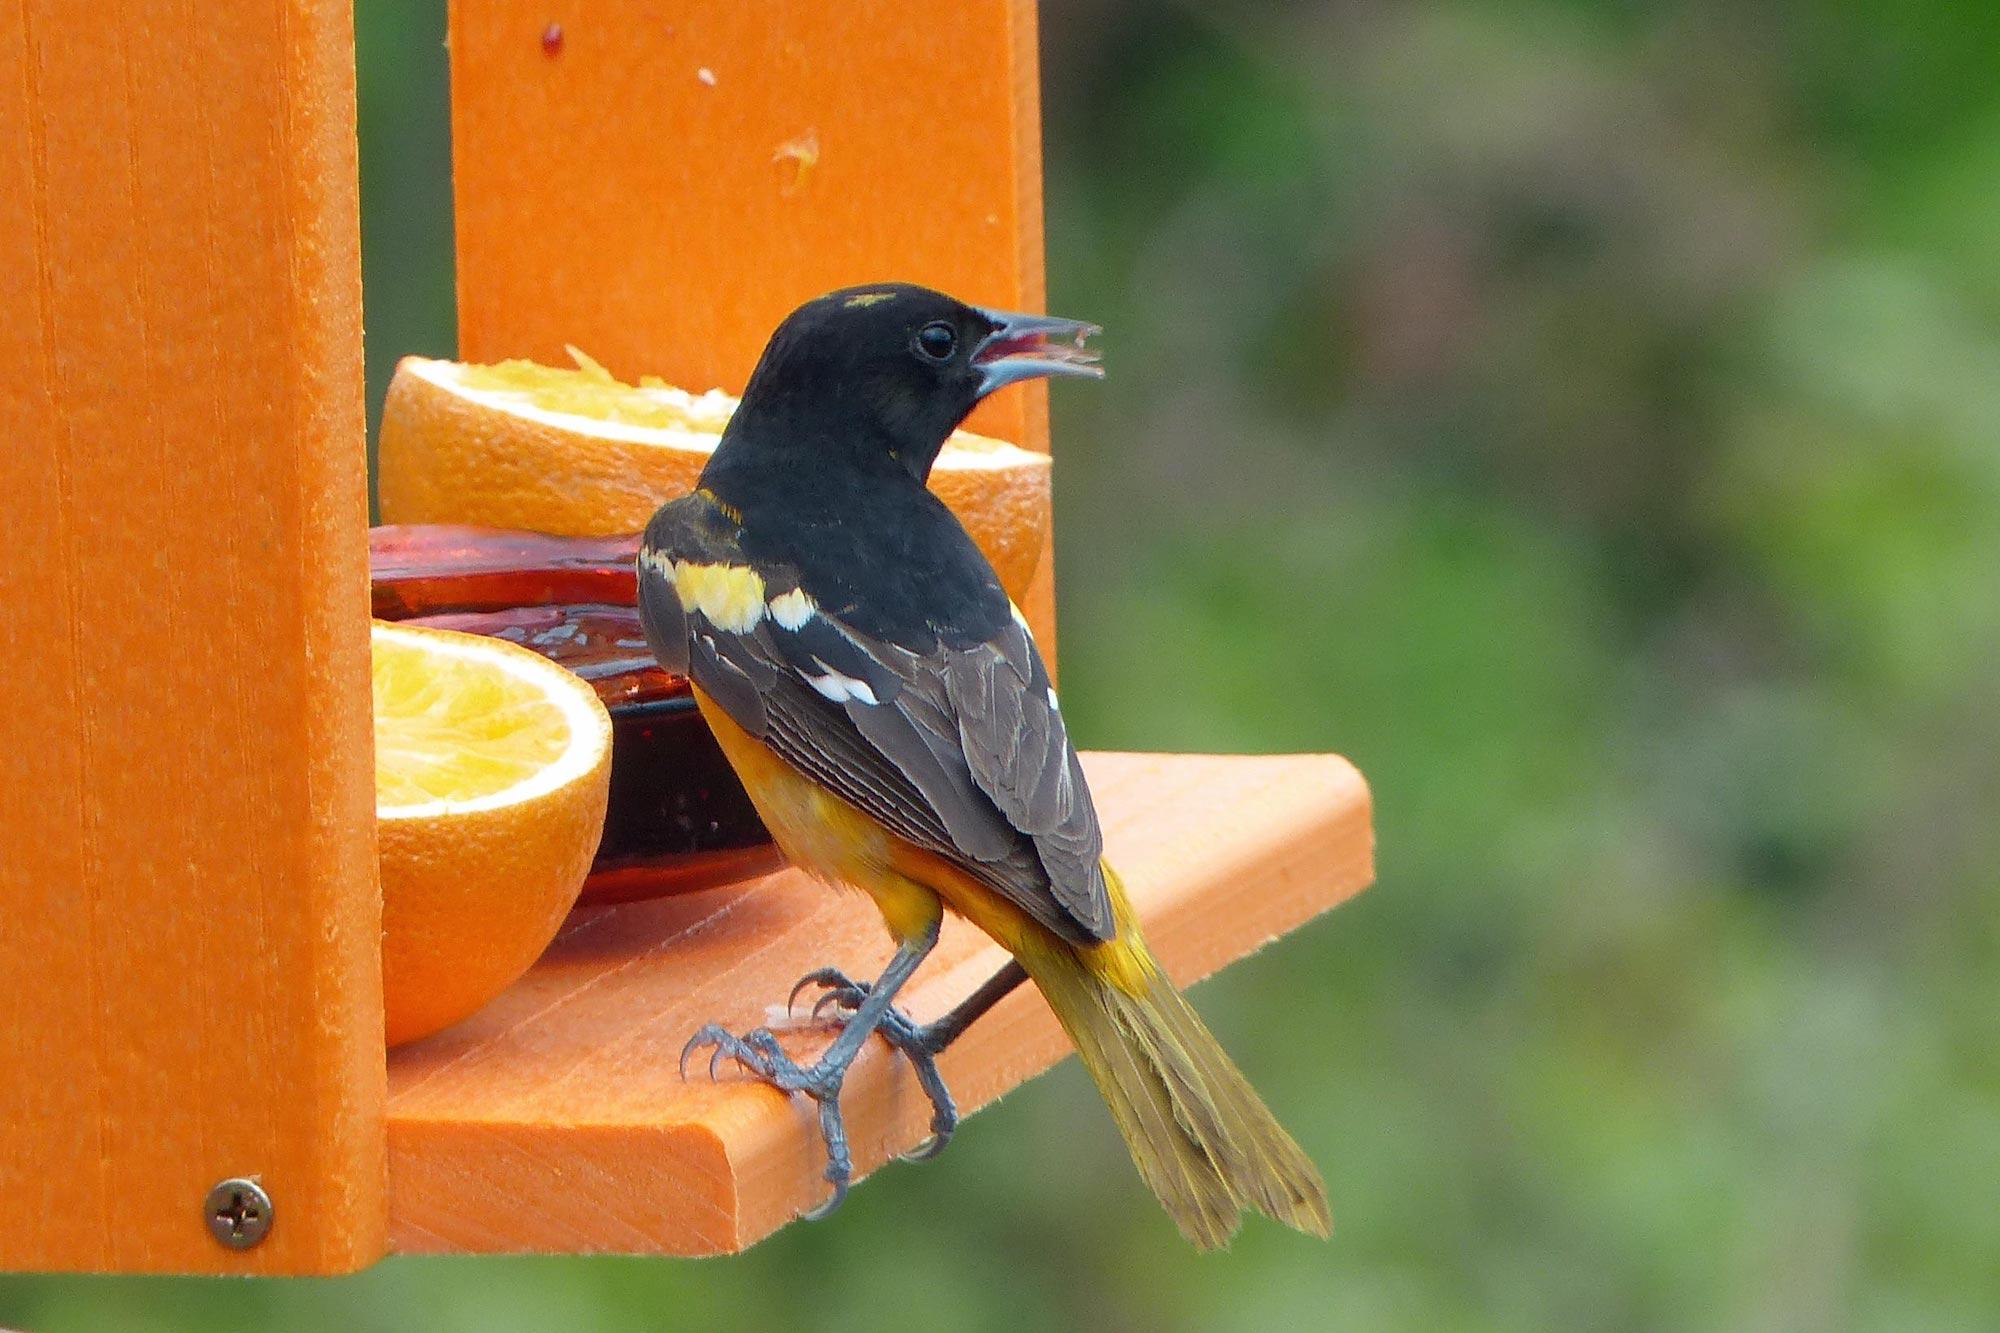 feeding birds jelly